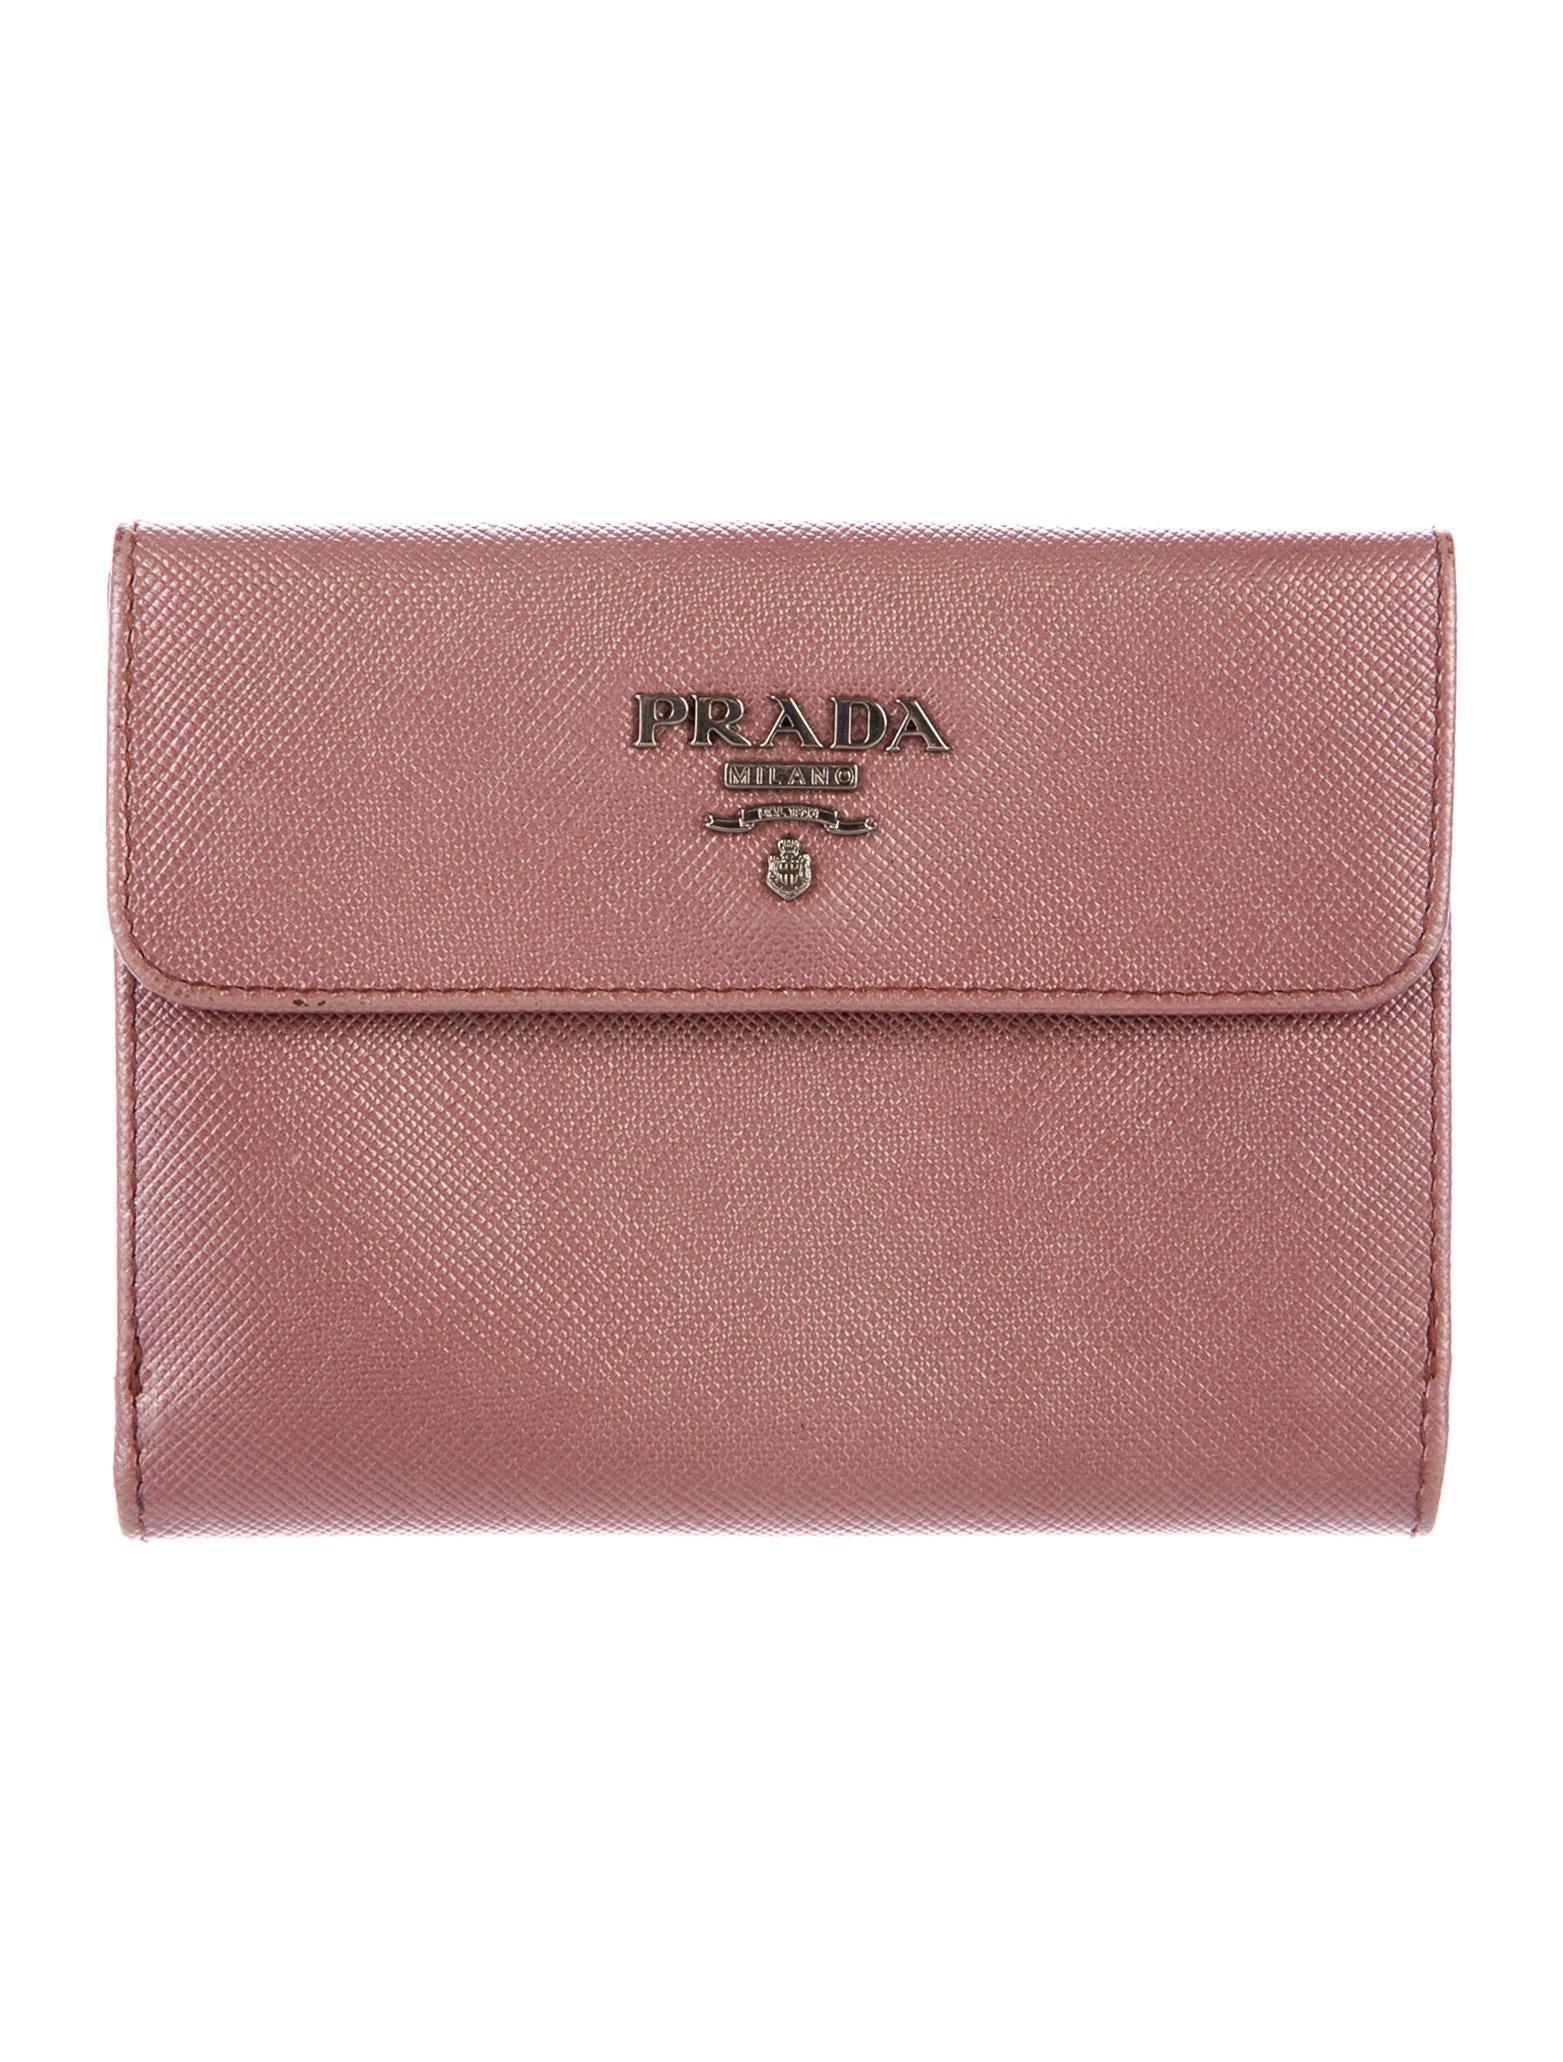 95c1baf414f9ba Prada French Wallet Review. Prada Saffiano French Purse Wallet - Accessories  ...